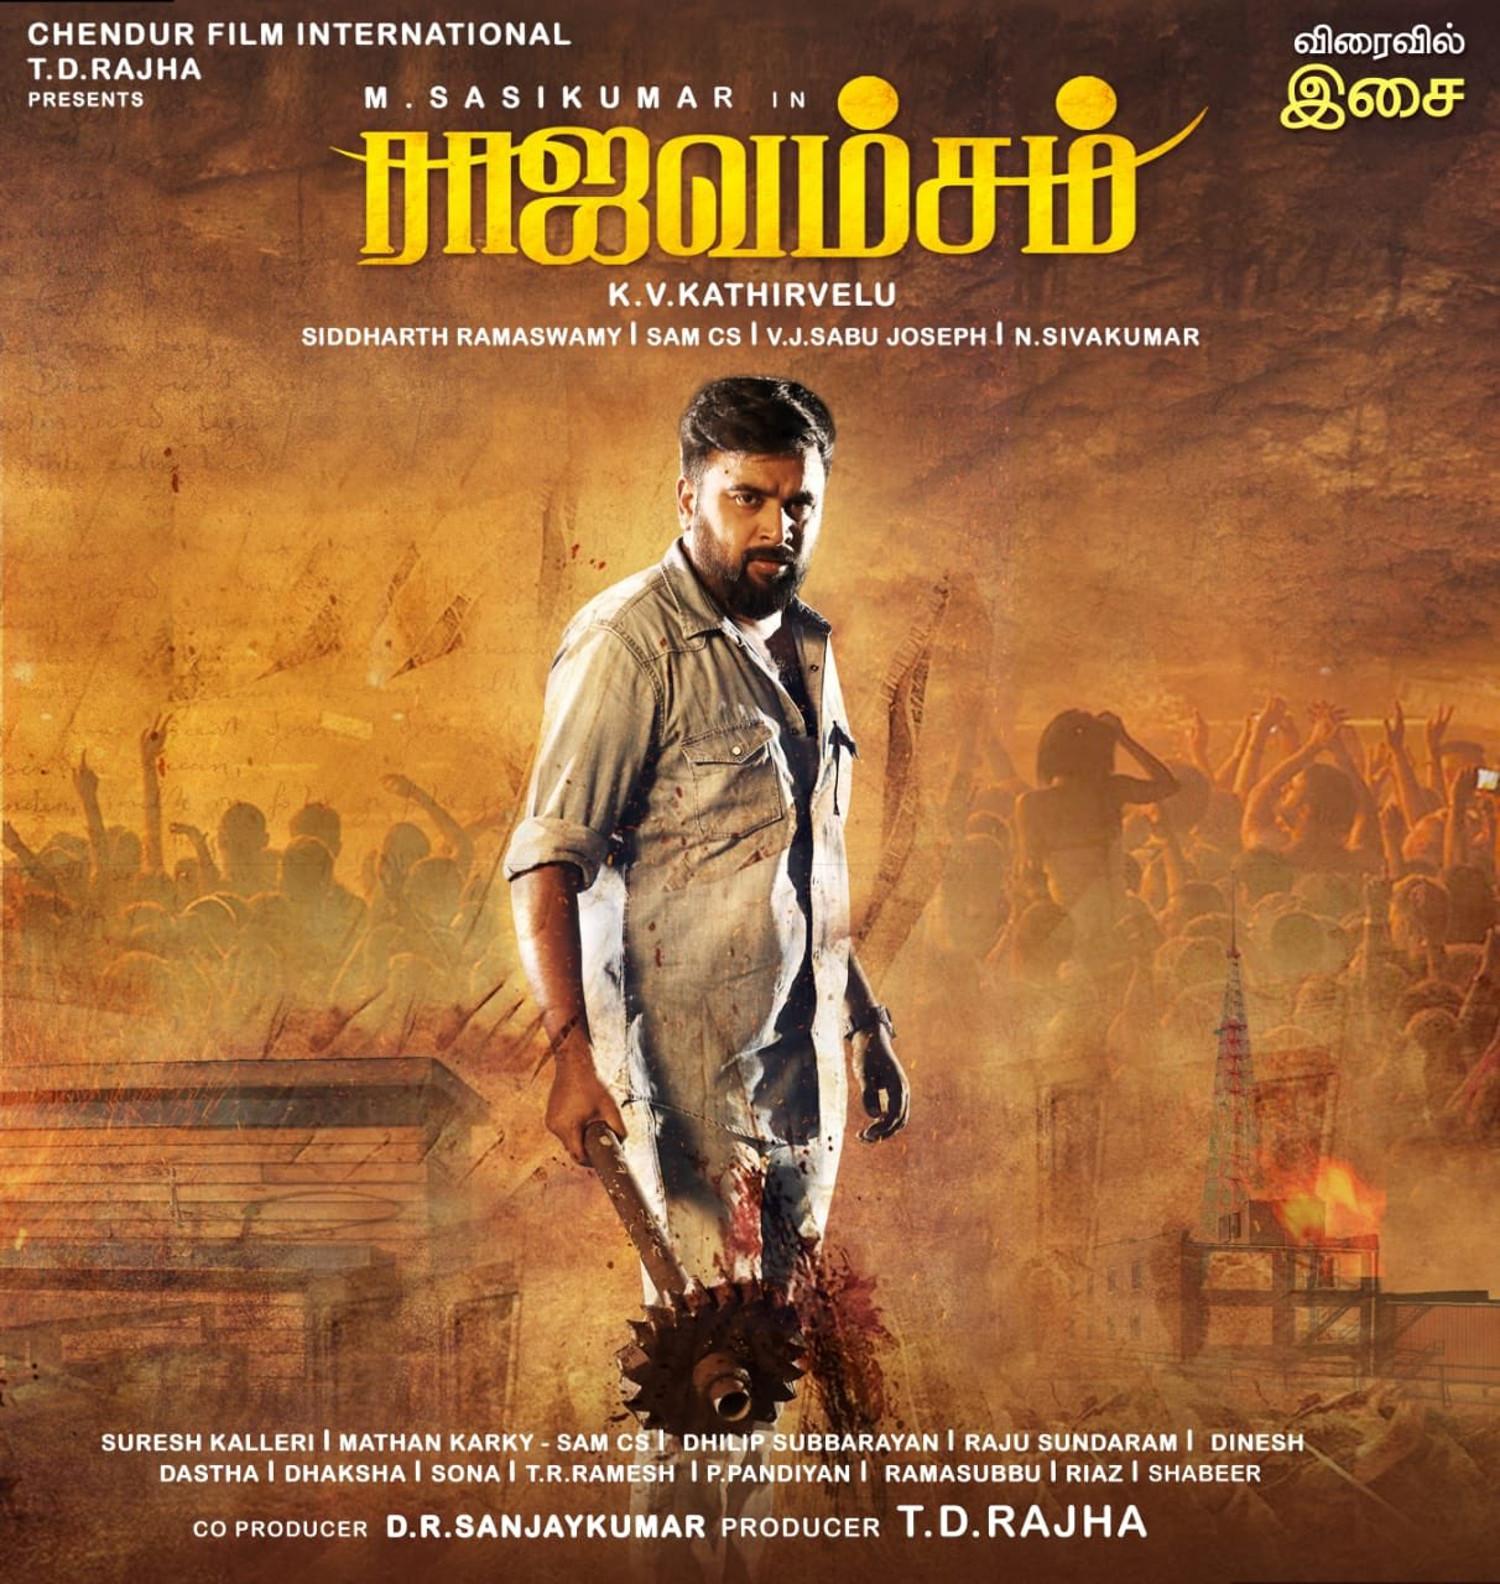 Sasikumar Rajavamsam Movie First Look Poster